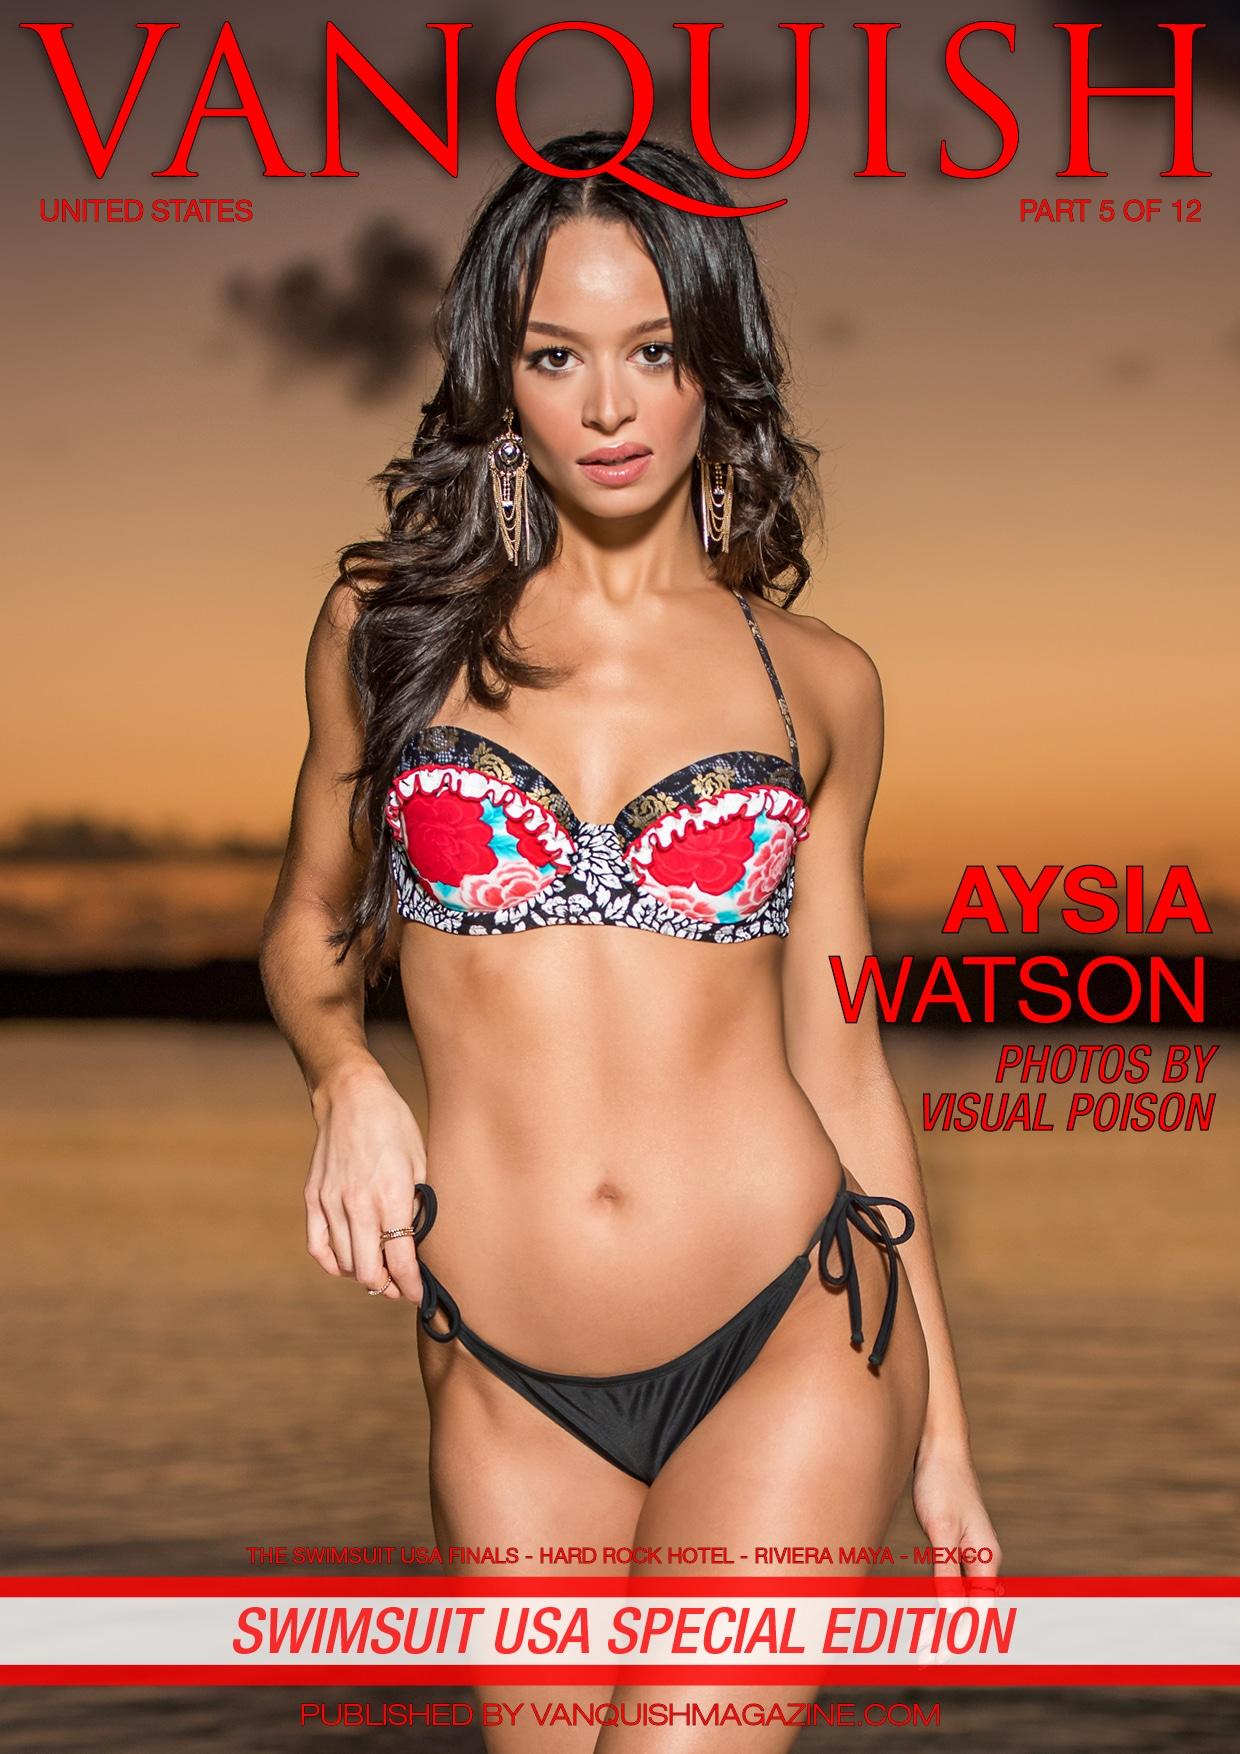 Vanquish Magazine - Swimsuit USA 2018 - Part 5 - Aysia Watson